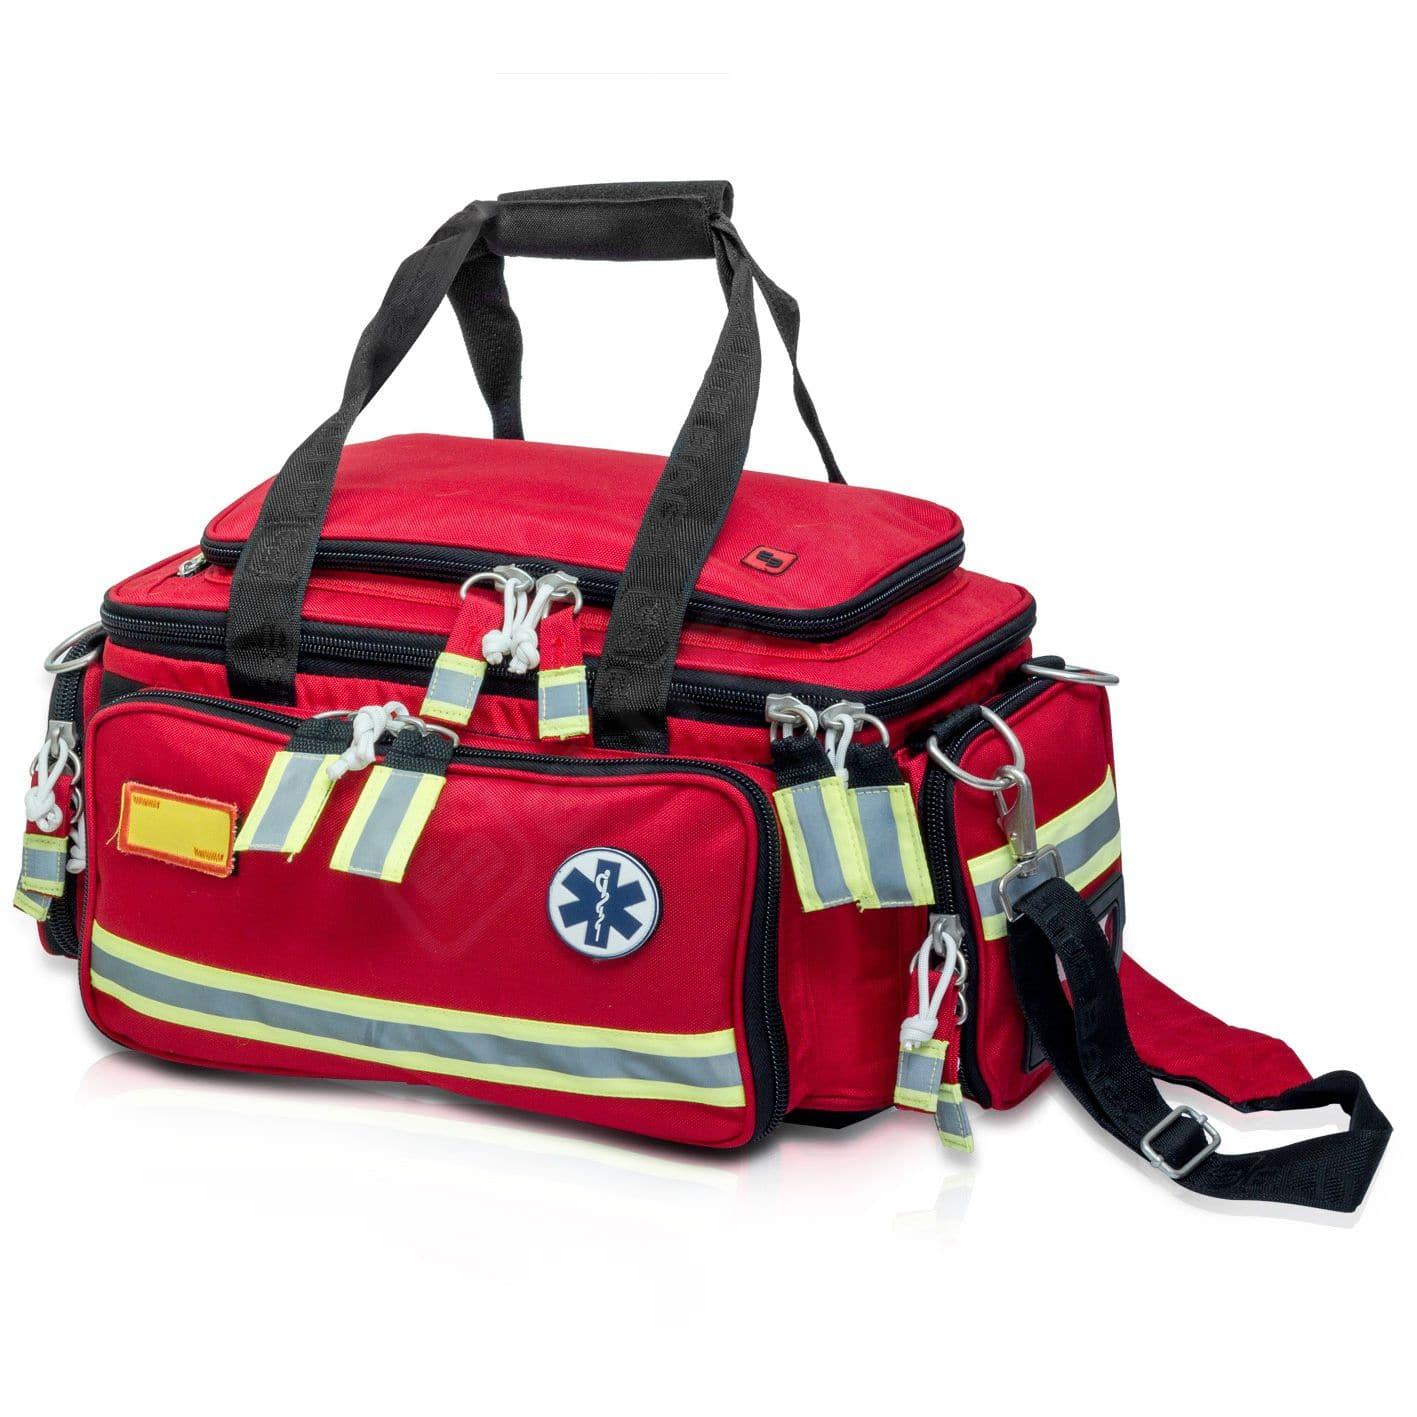 Emergency Bag Backpack Washable Eb02 008 009